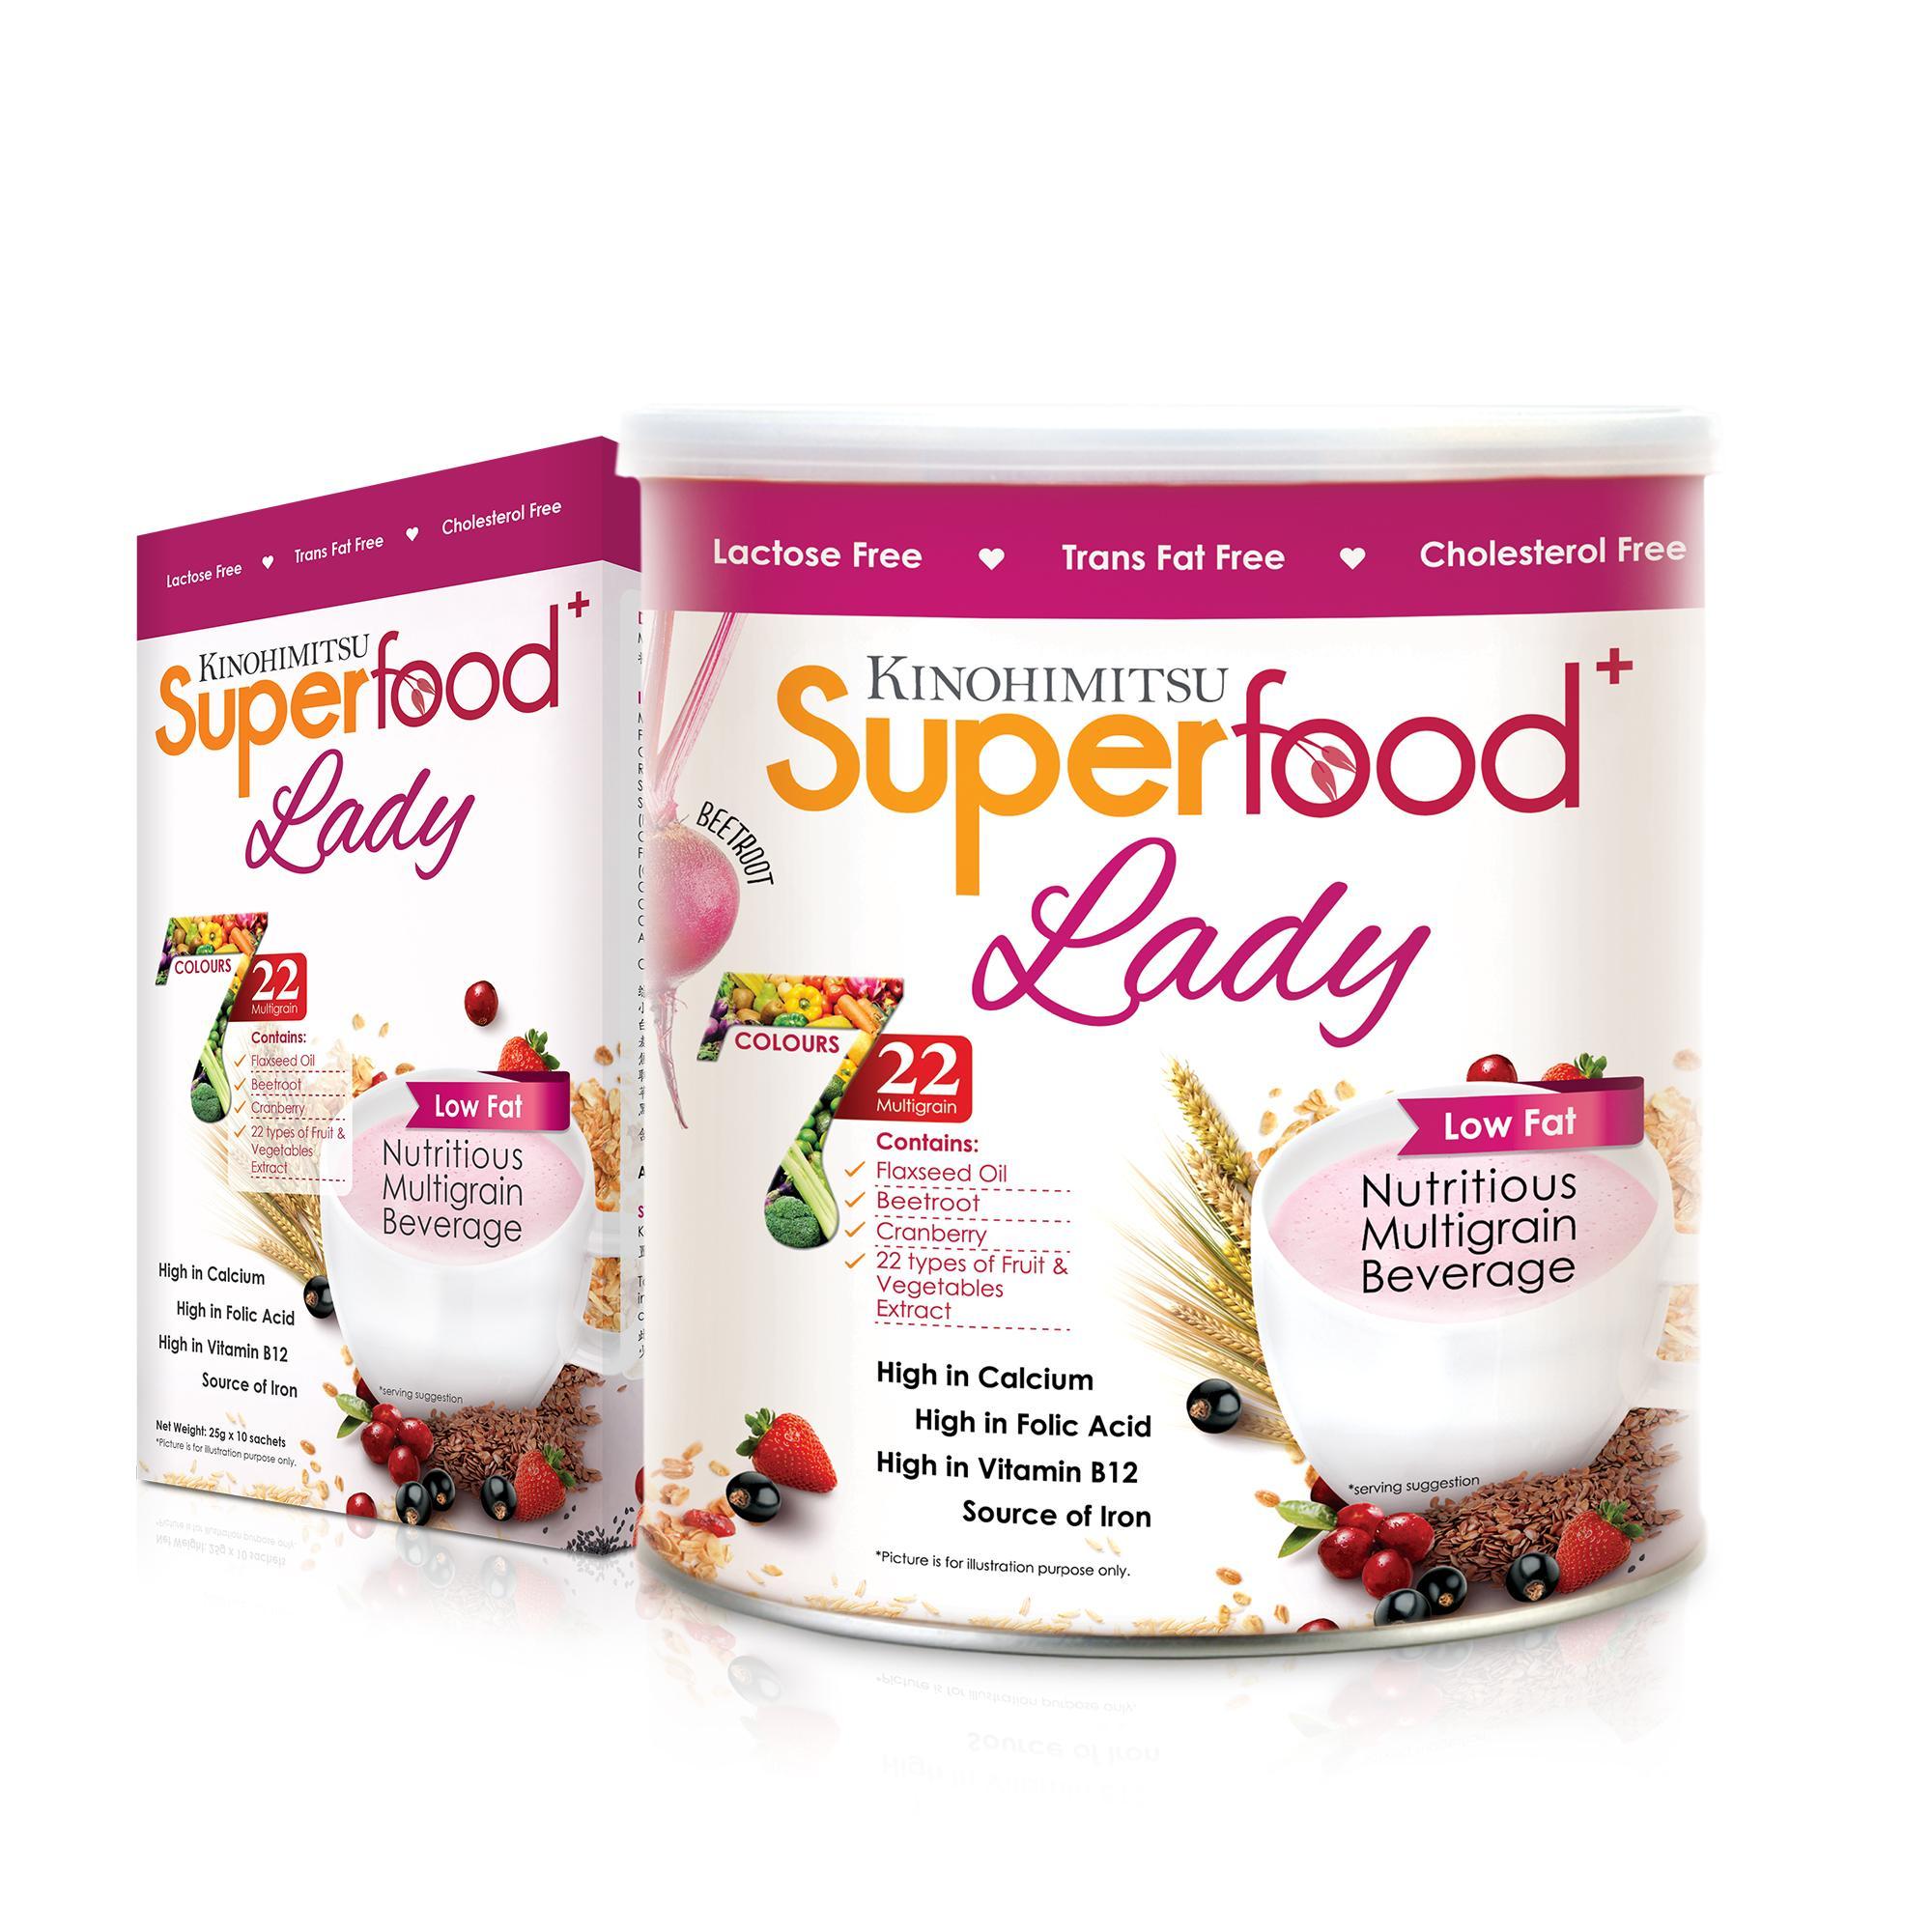 Kinohimitsu Superfood+ Lady 500g + 10 Sachets By Kinohimitsu.